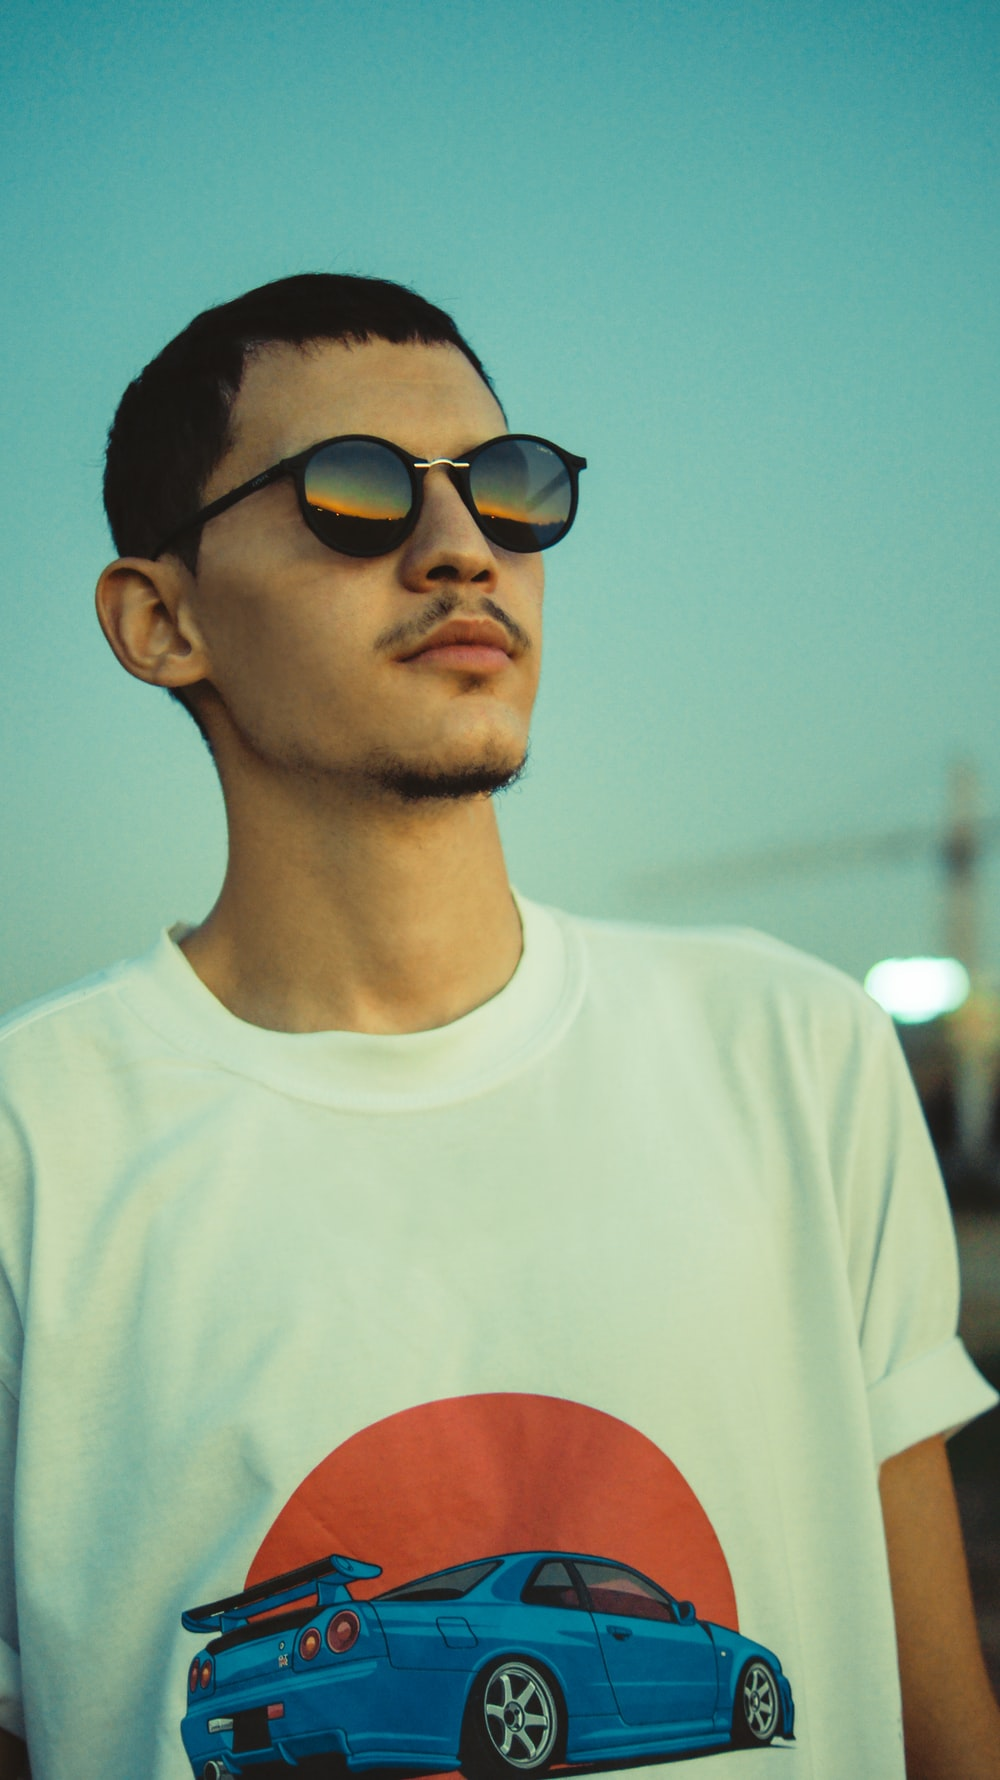 man in white crew neck shirt wearing black sunglasses